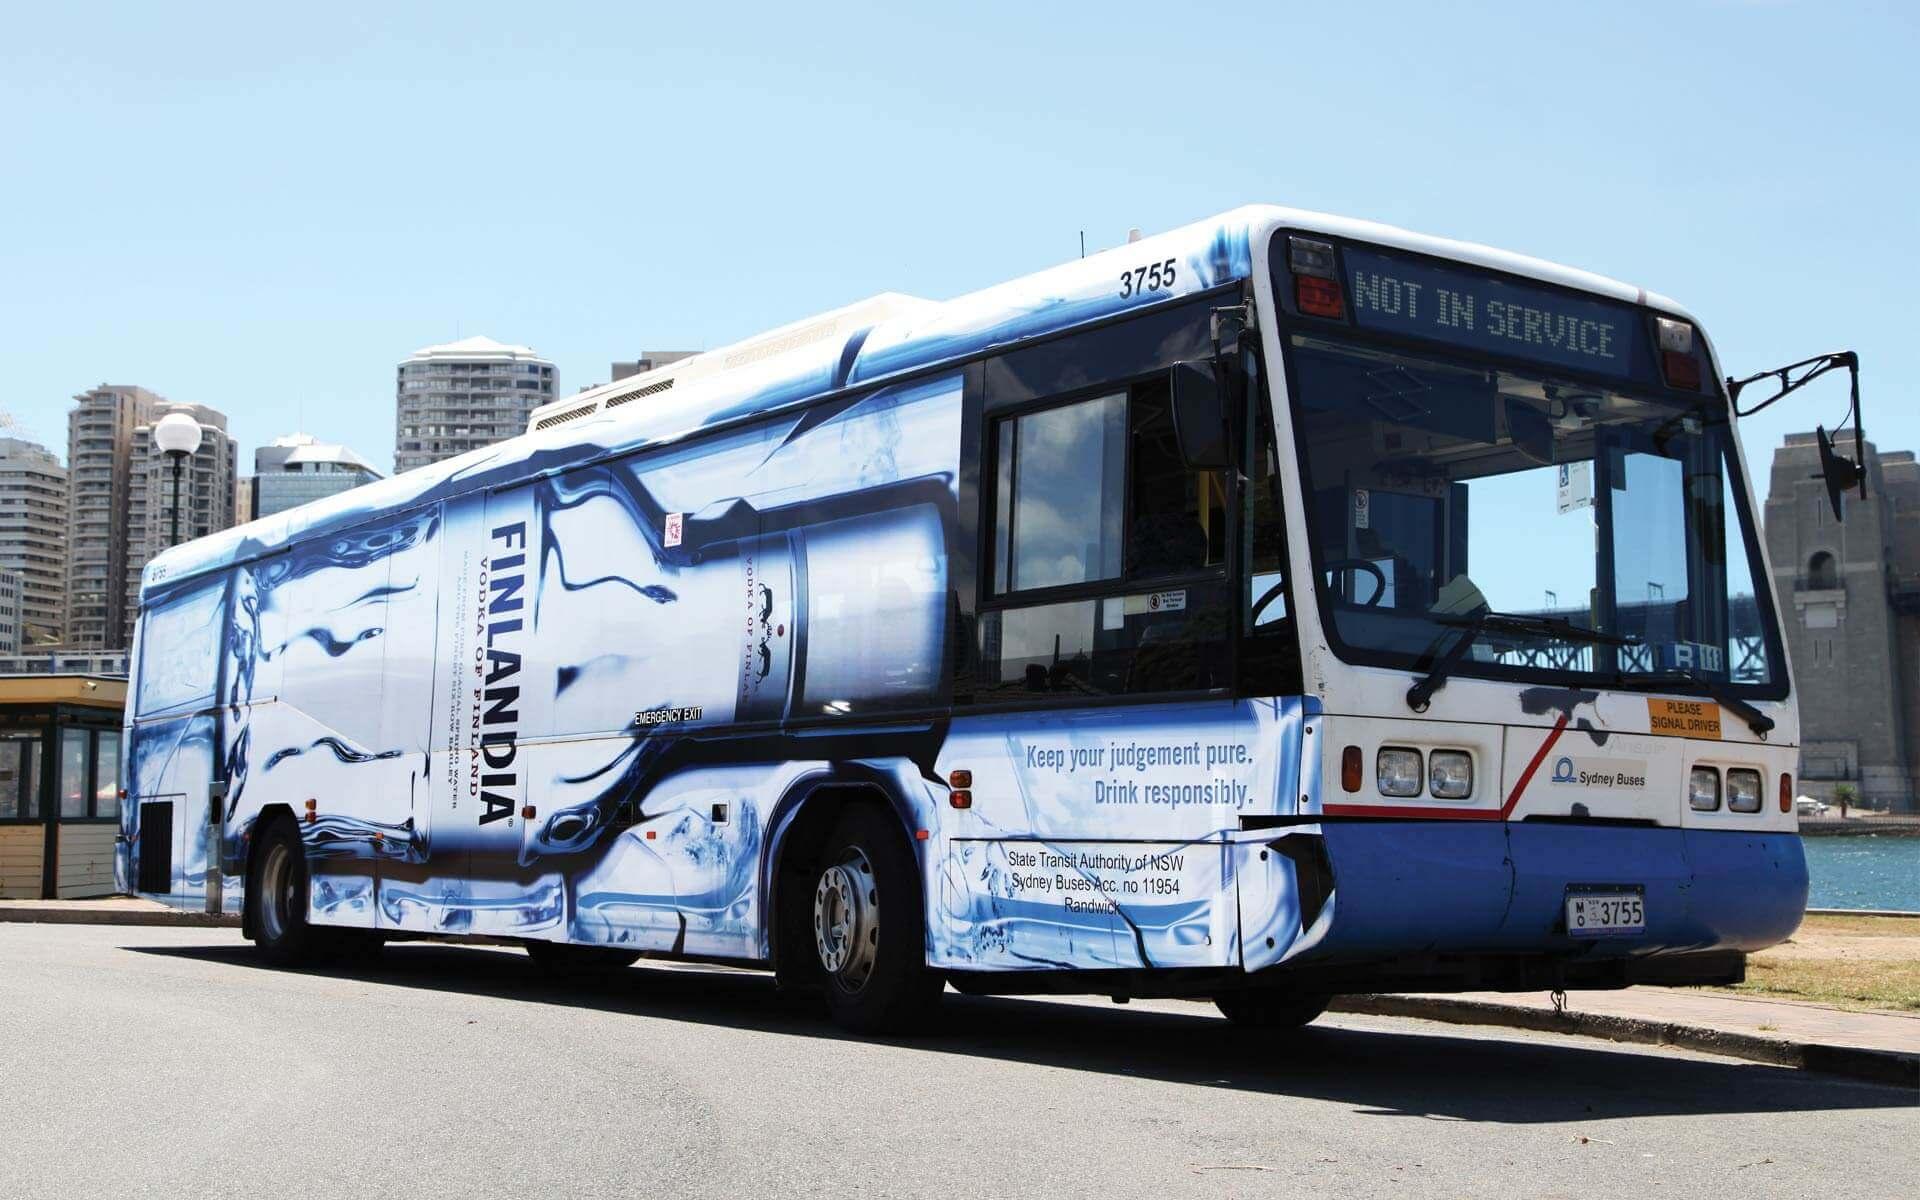 Finlandia bus wrap, side view